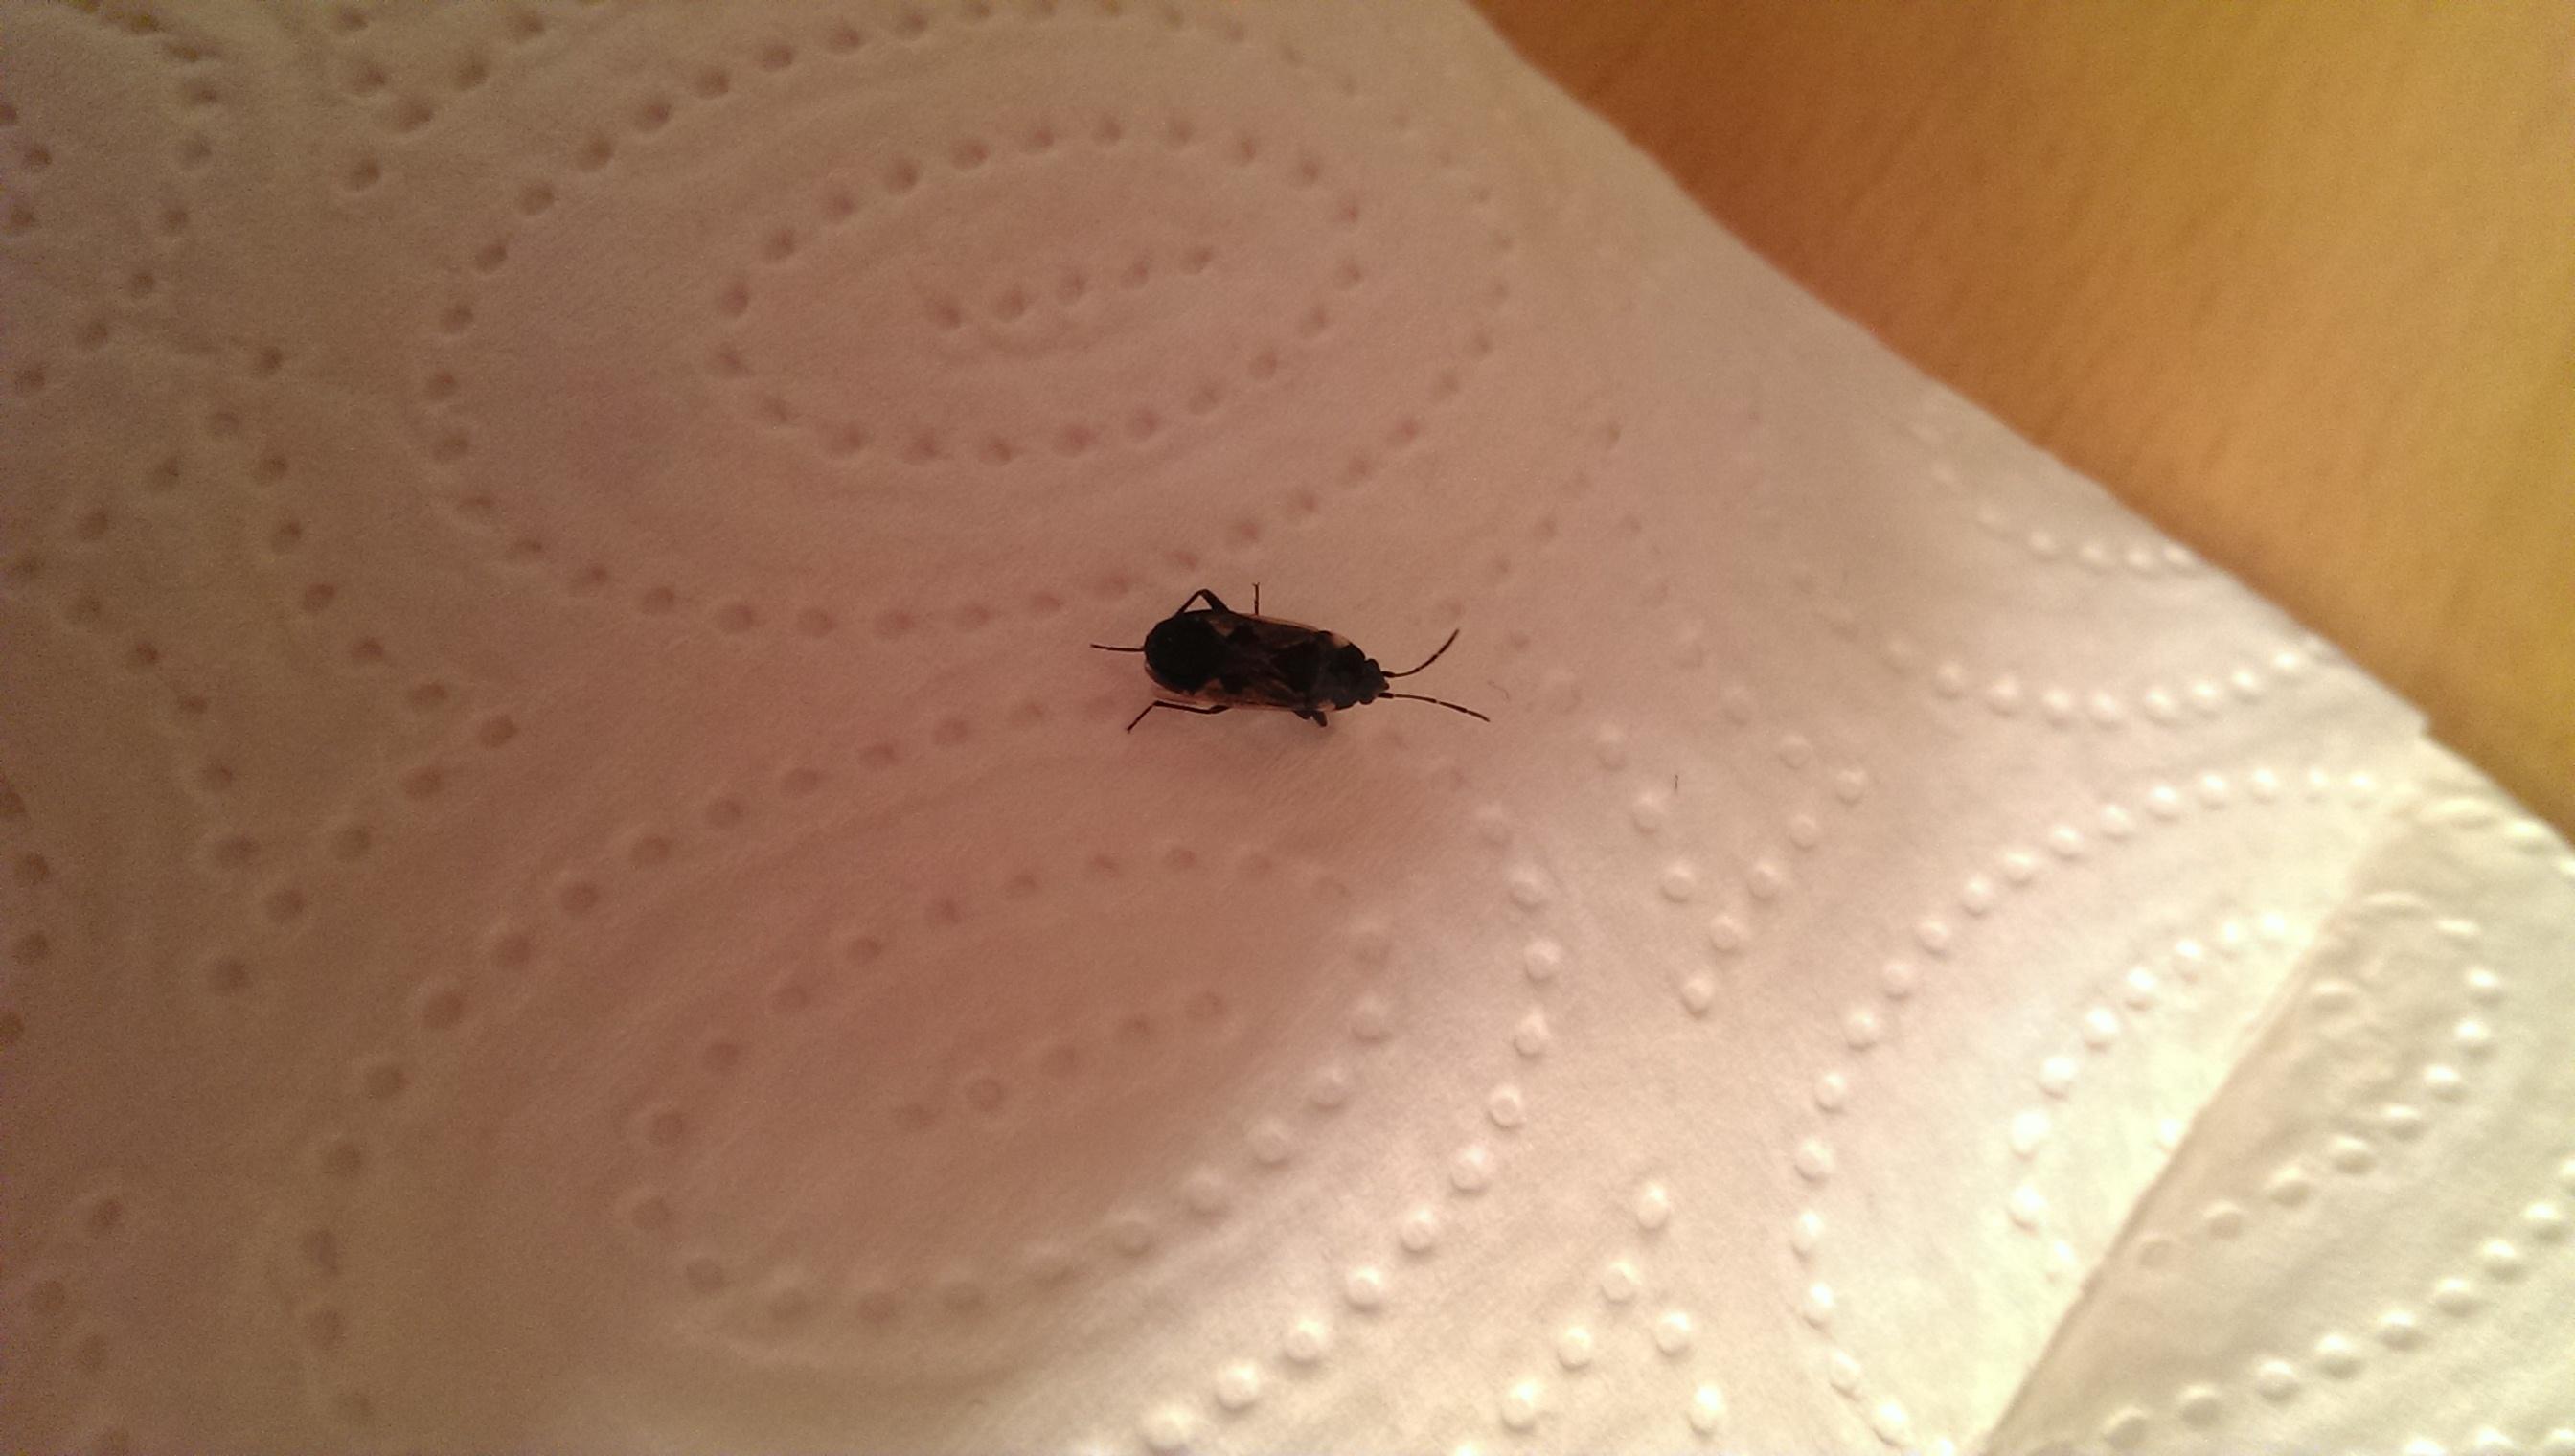 bettwanze aussehen ungeziefer parasiten bettwanzen. Black Bedroom Furniture Sets. Home Design Ideas